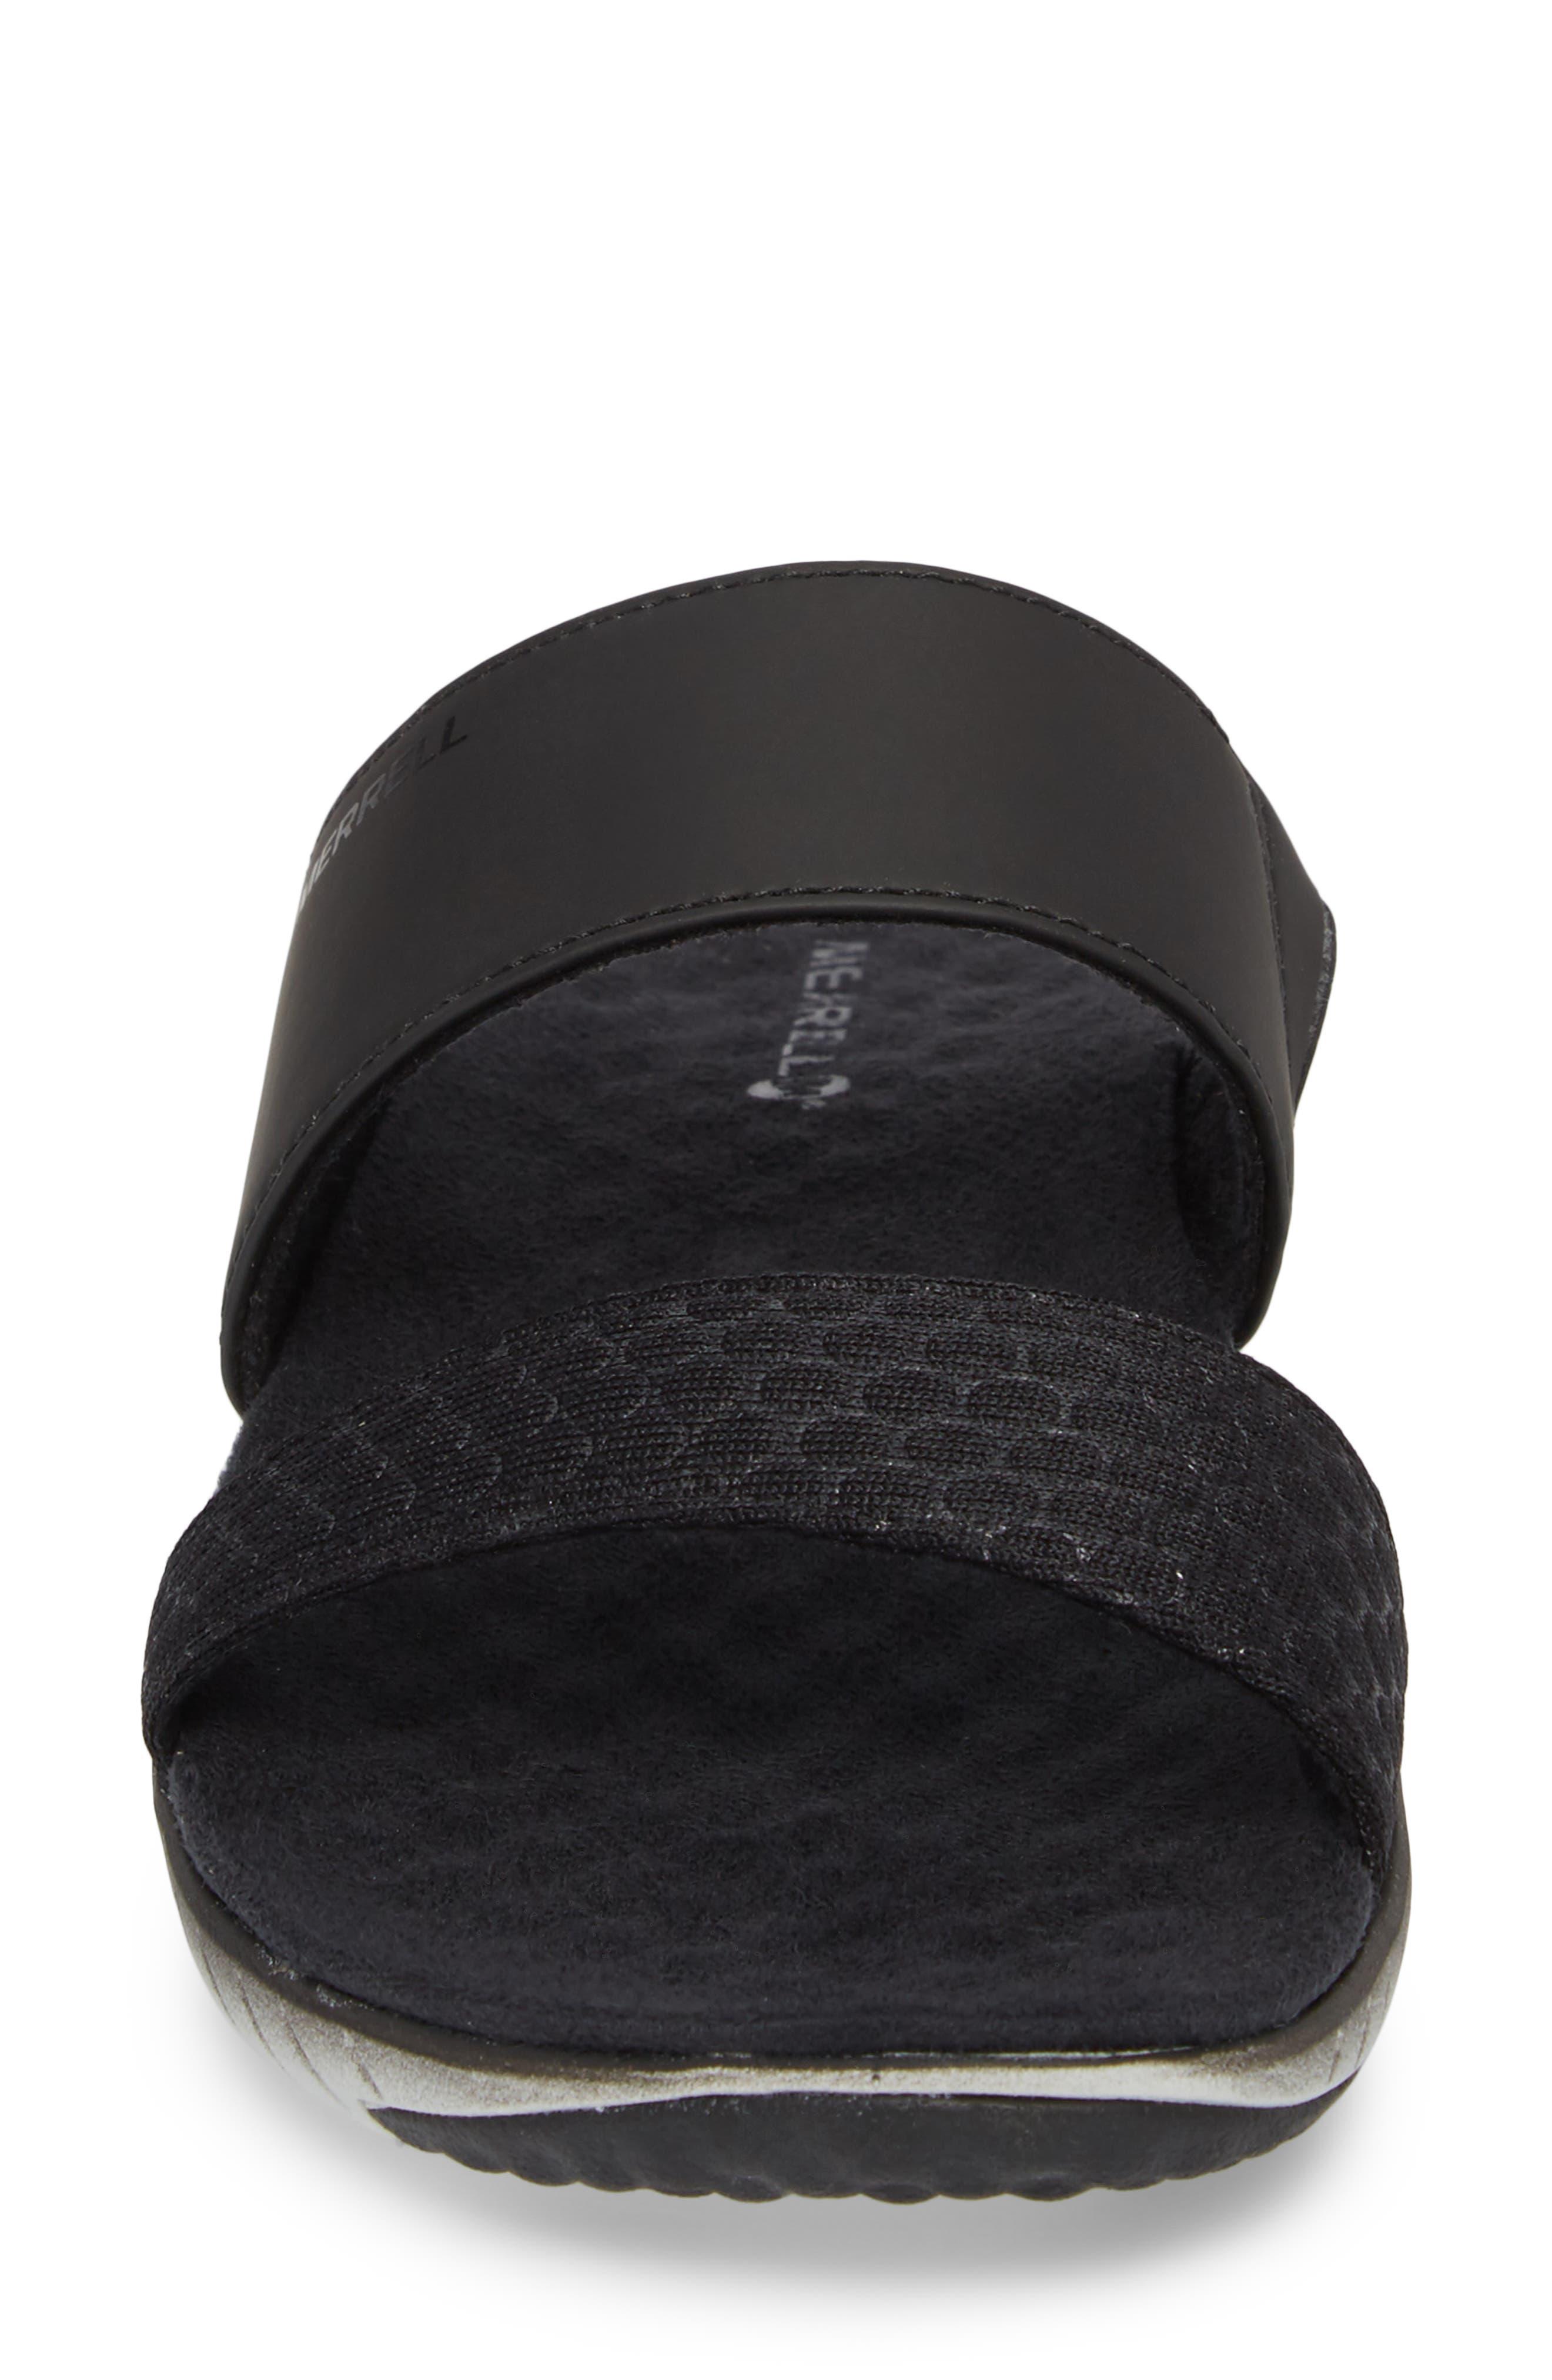 1SIX8 Linna Air Cushion+ Slide Sandal,                             Alternate thumbnail 4, color,                             Black